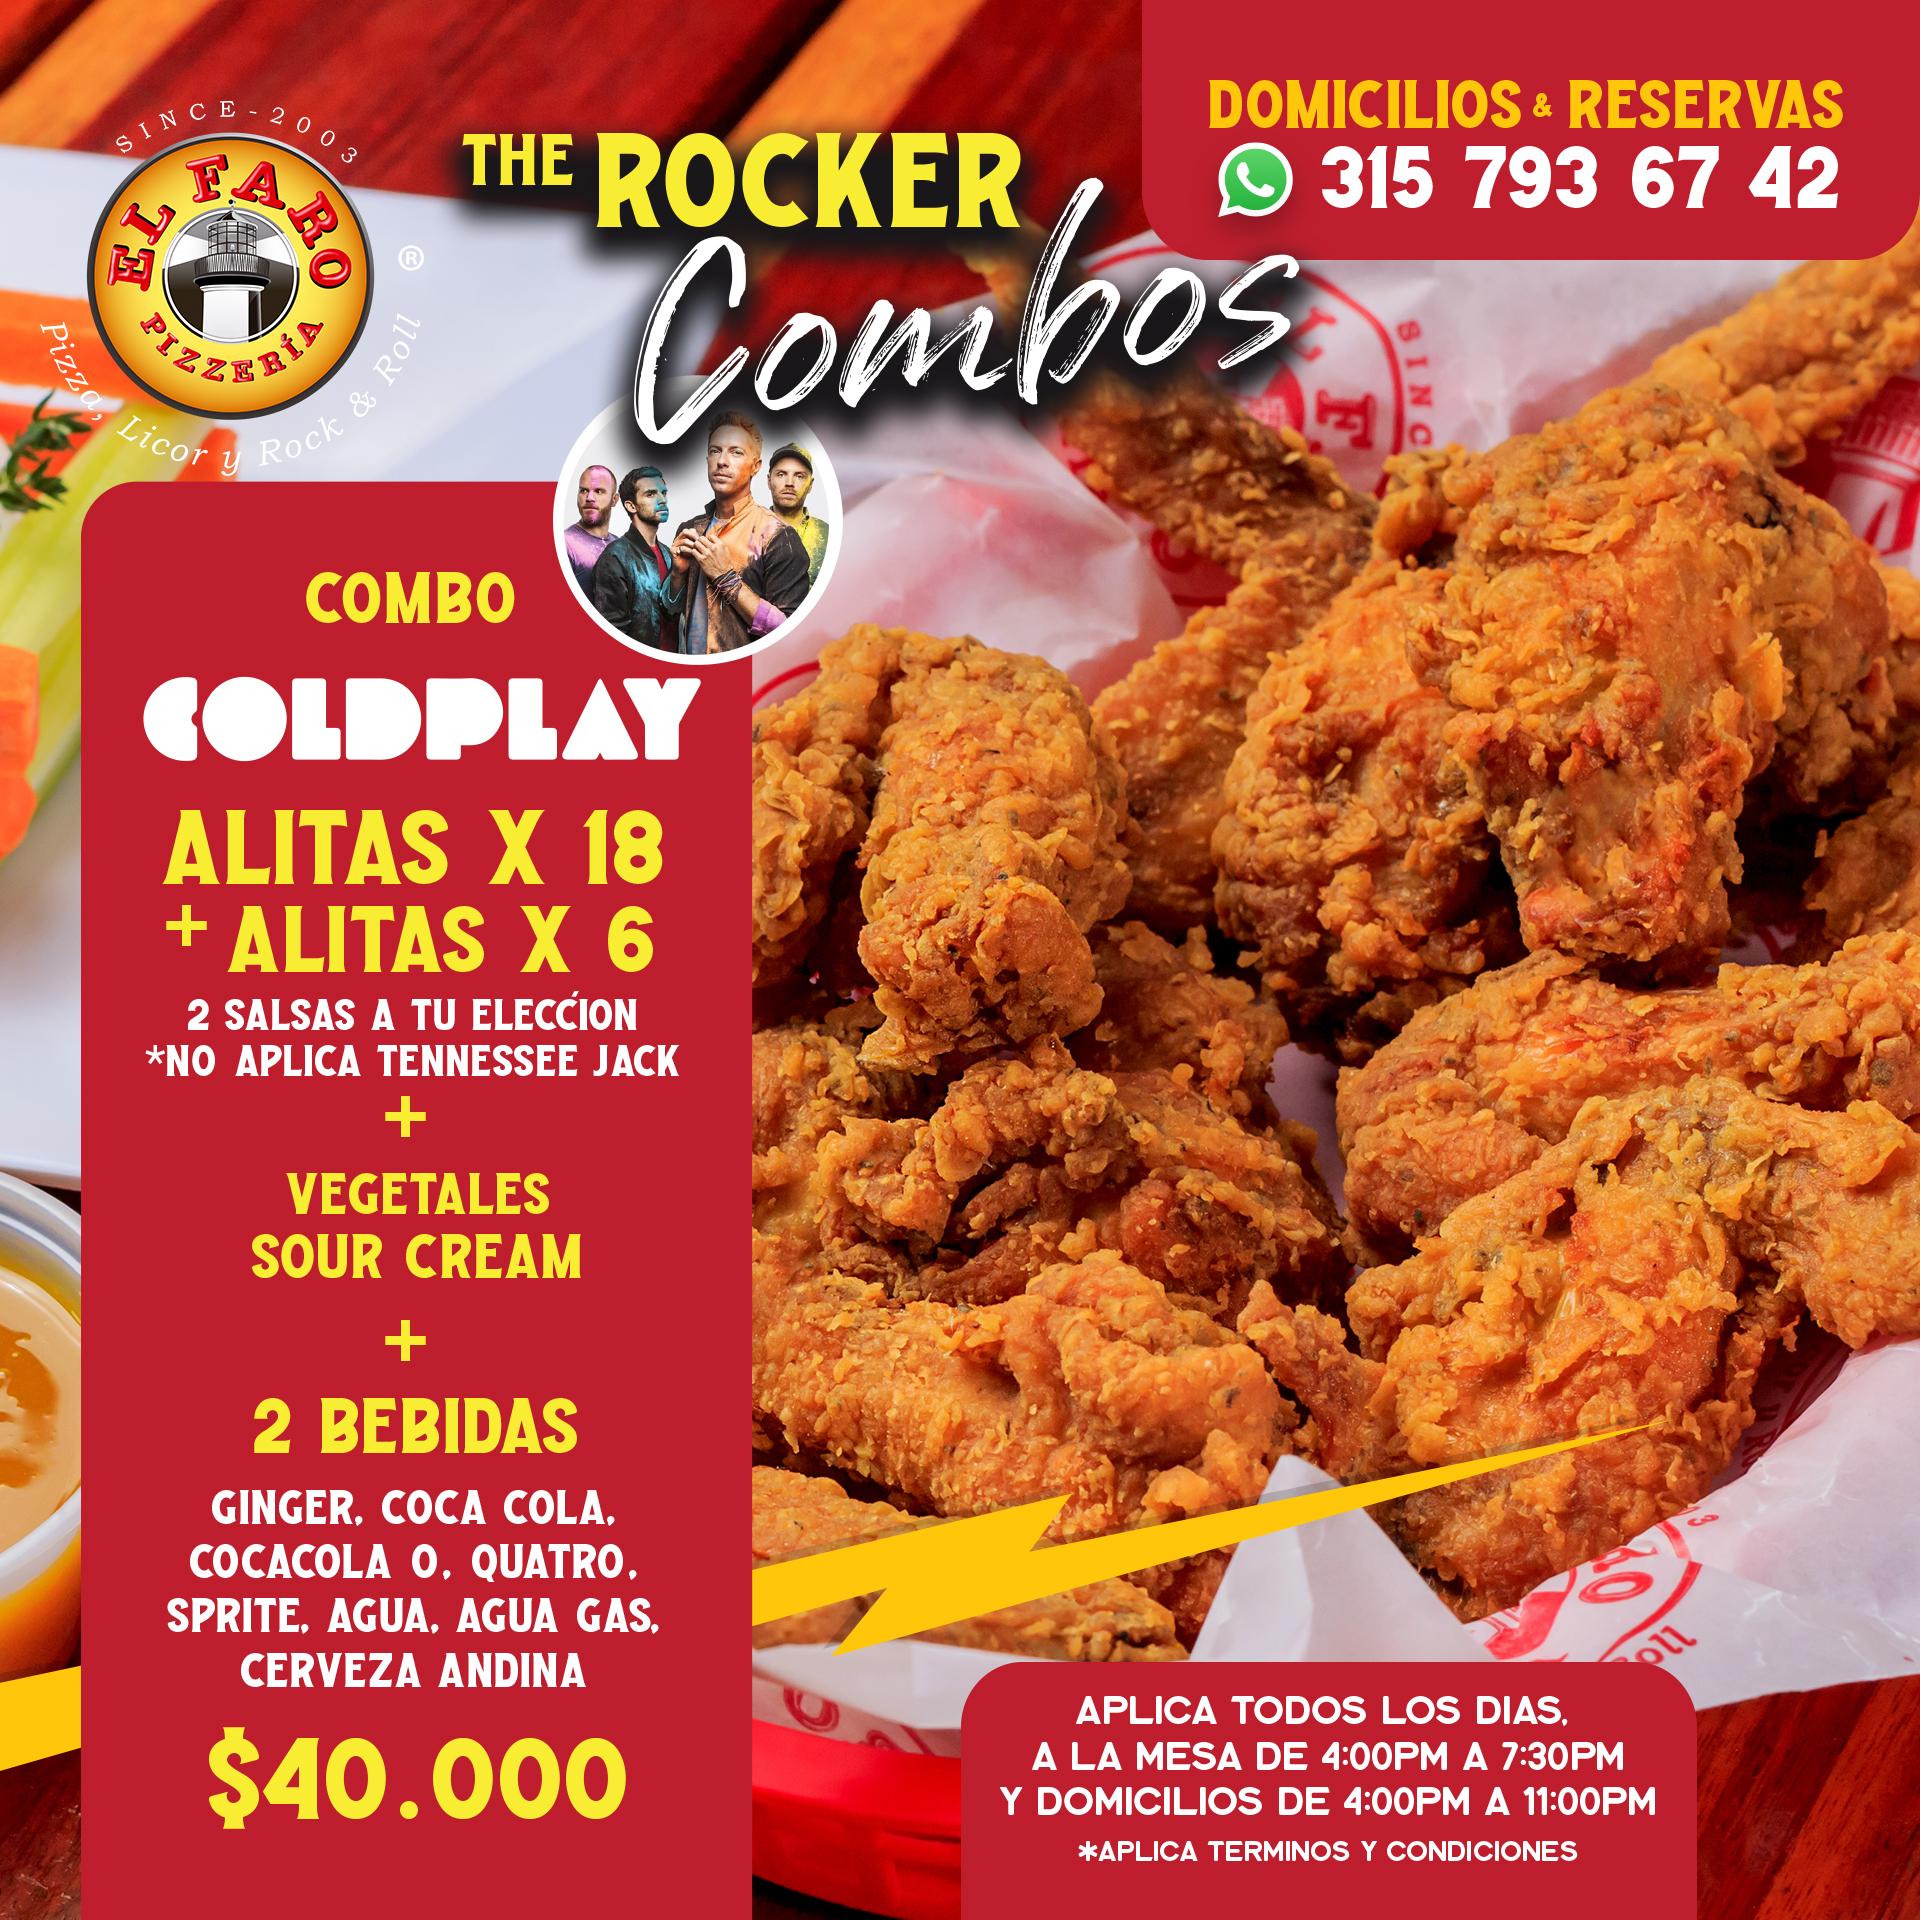 4--ROCKER-COMBO-5---COLDPLAY-SQ